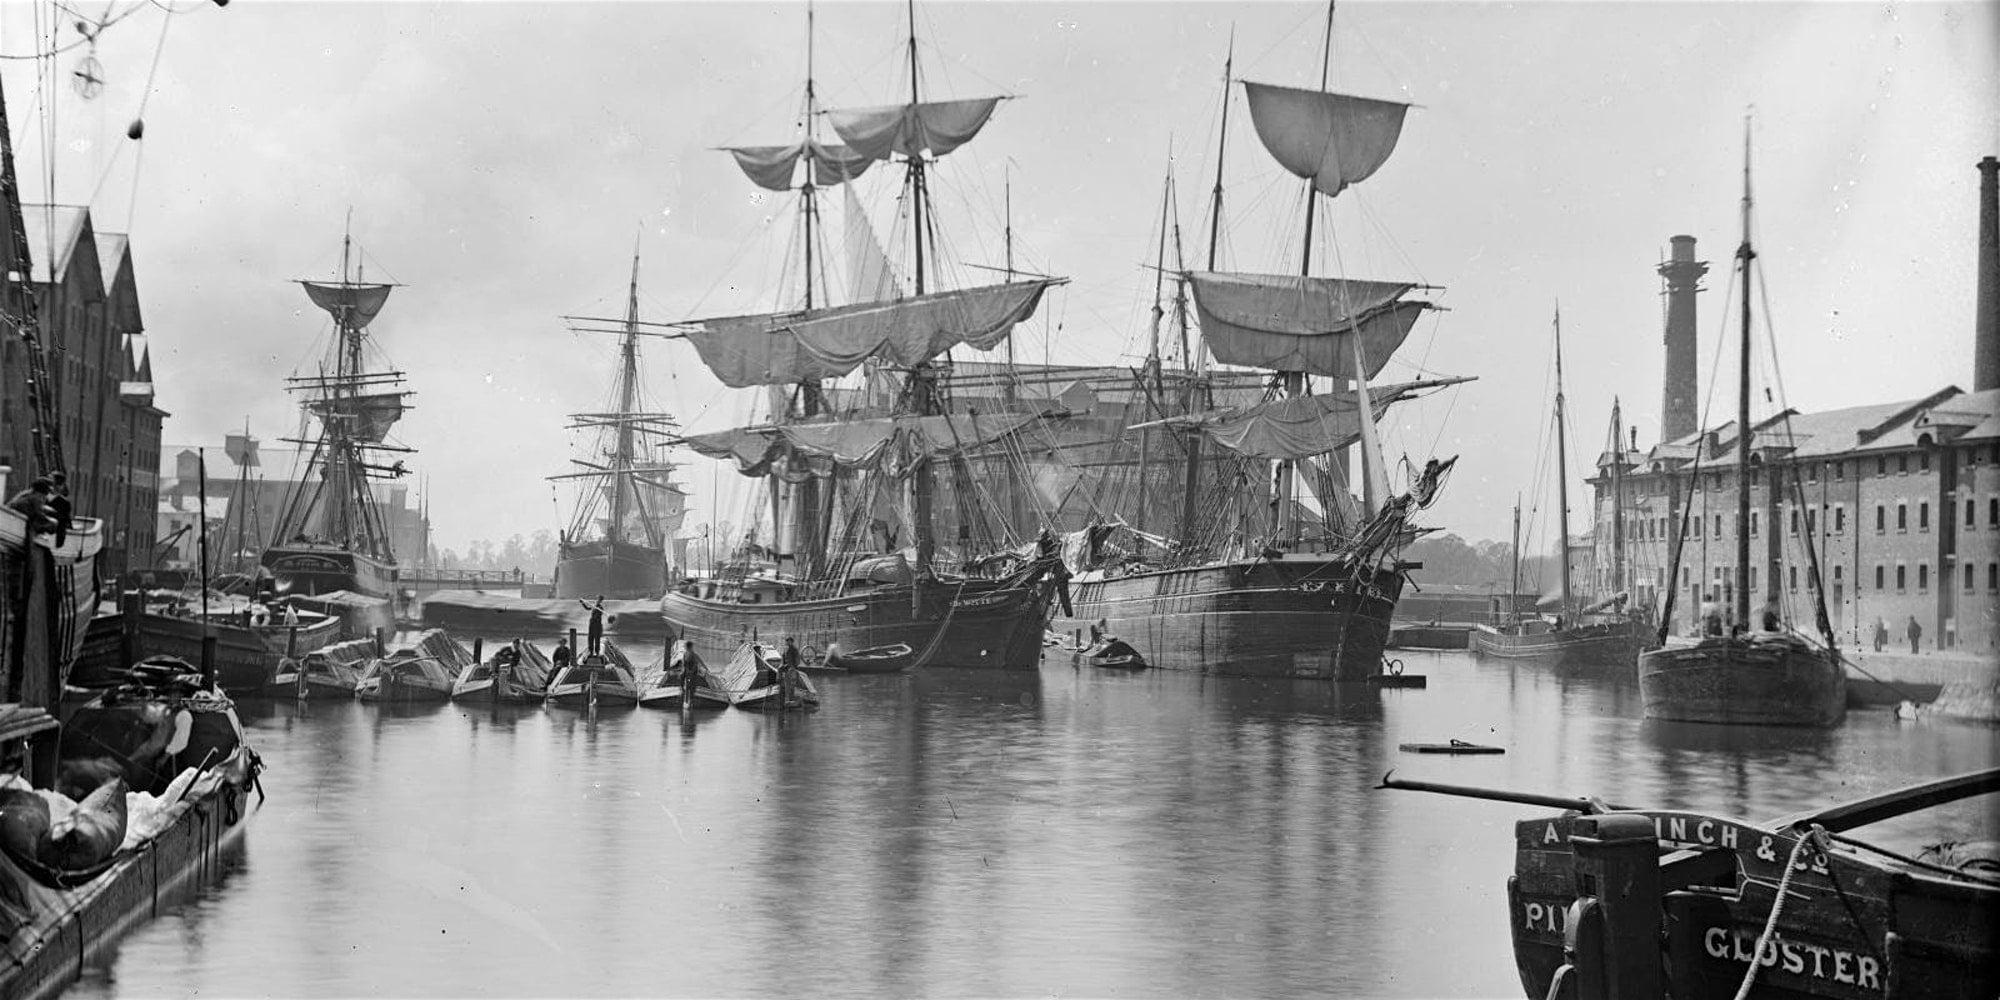 Gloucester Docks: Past, Present, Future